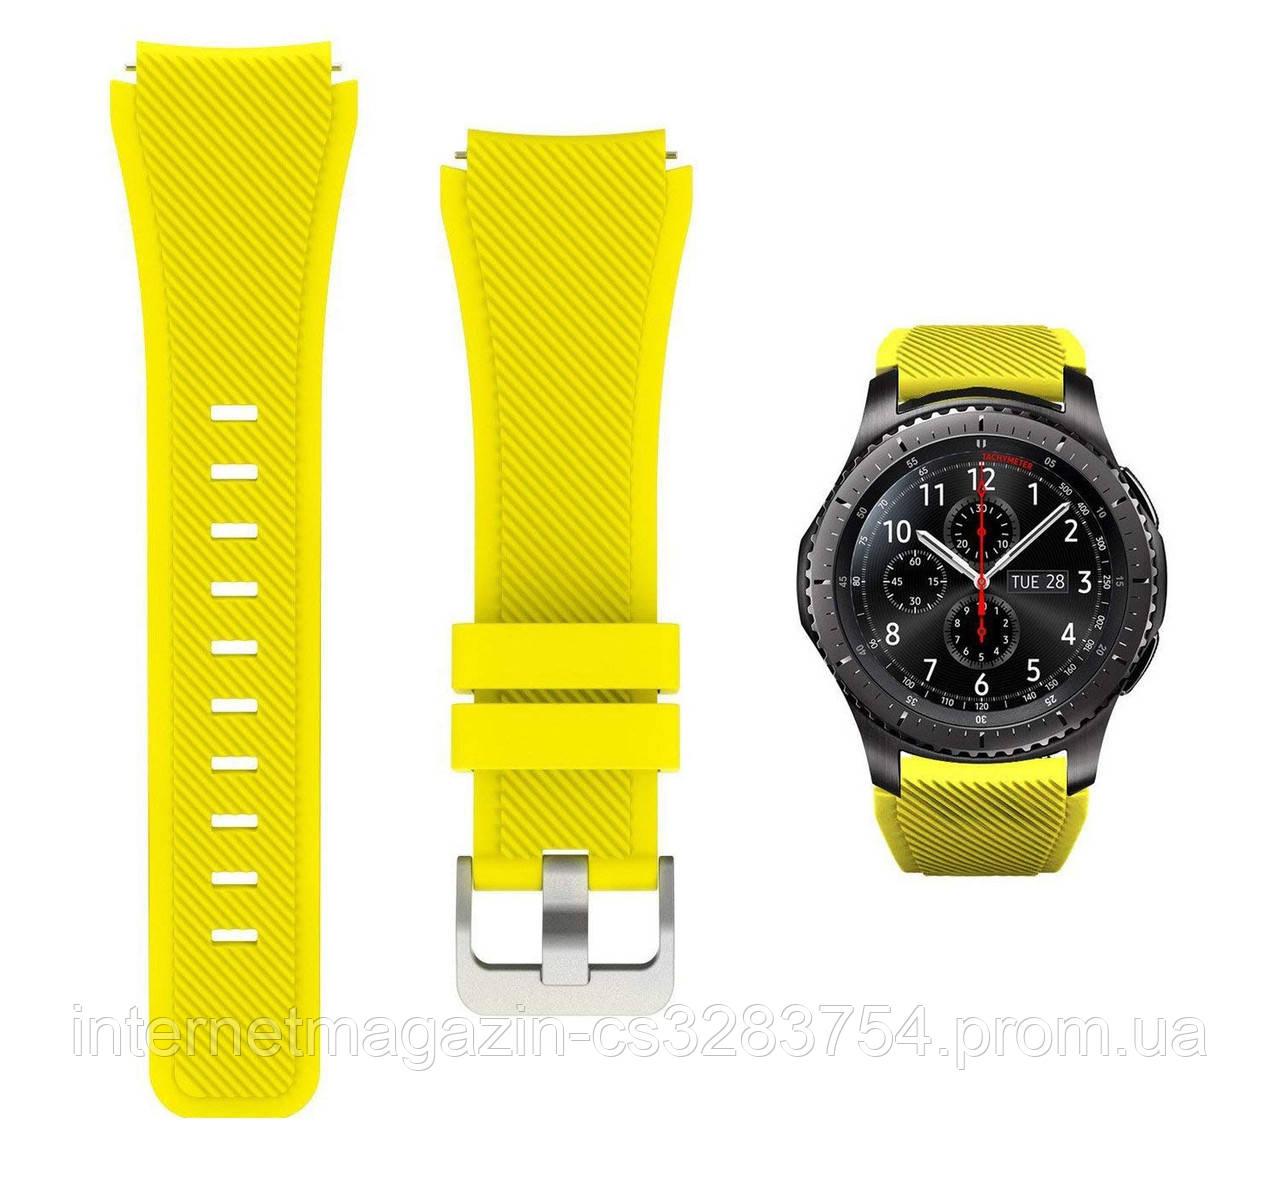 Ремешок 22 мм BeWatch ECO для Samsung Galaxy Watch 46mm | Samsung Gear S3 Желтый (1021120.3)